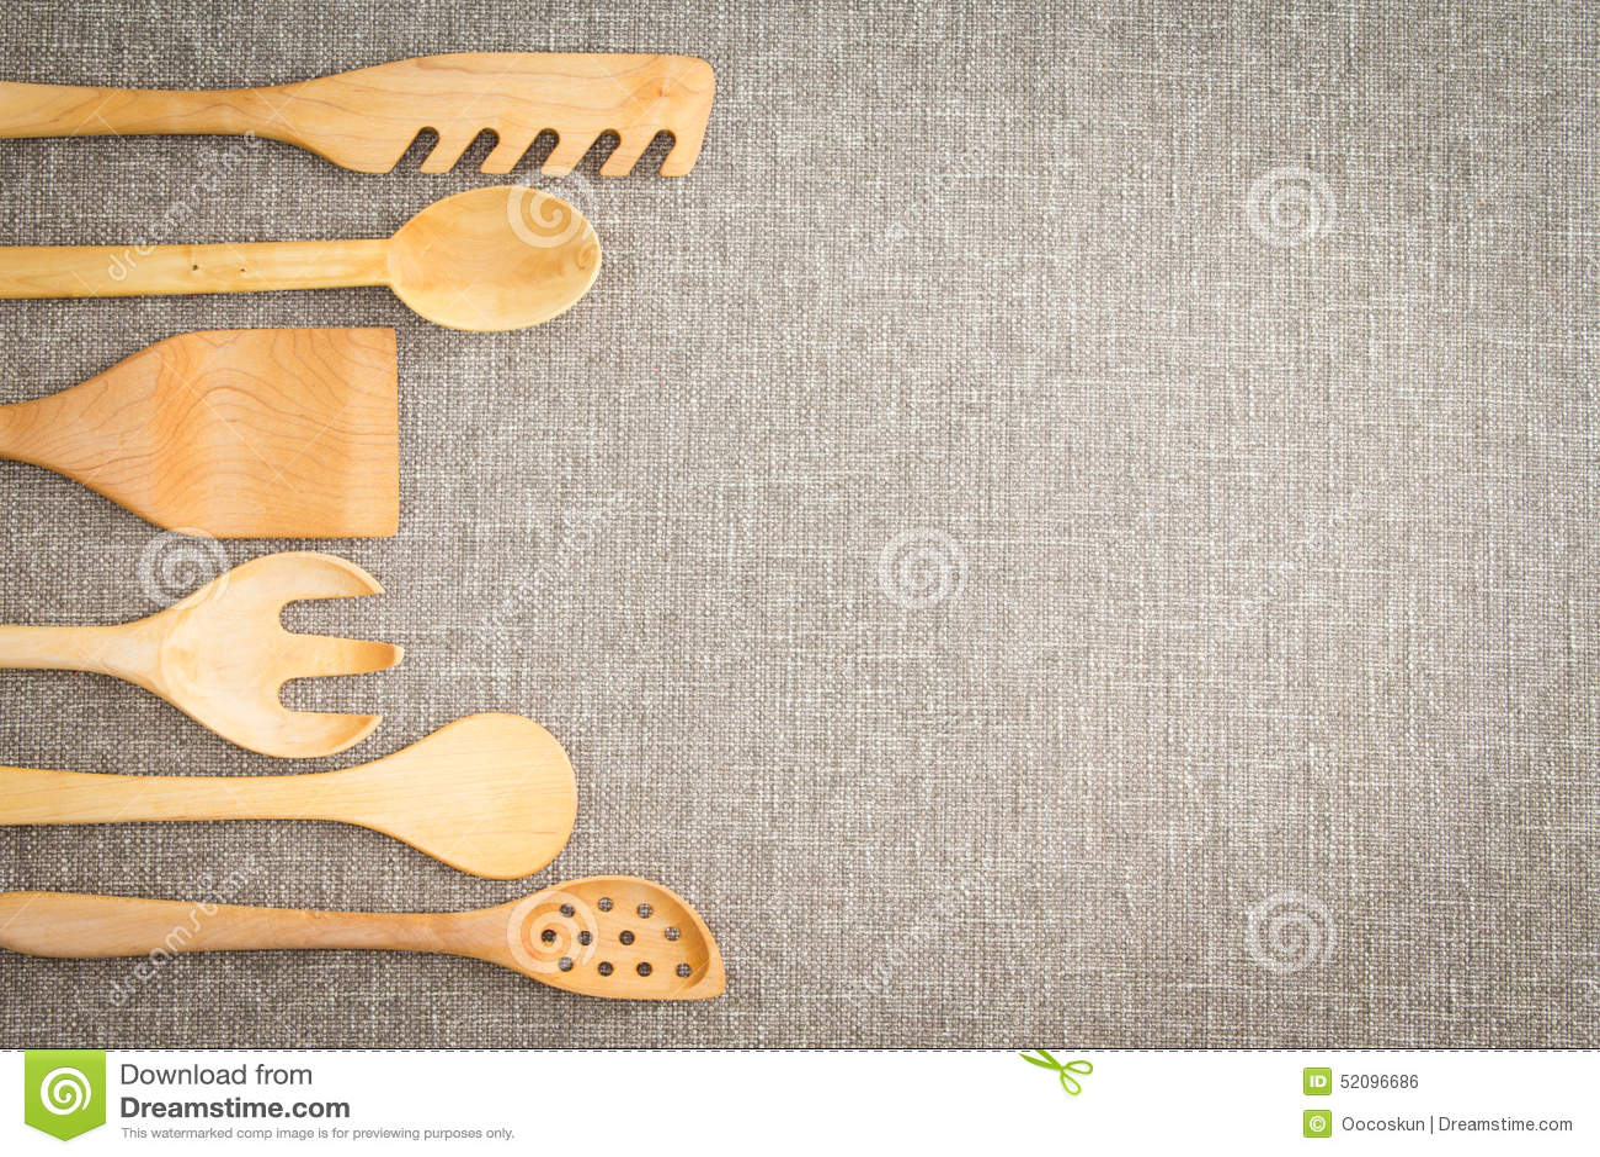 kitchen utensil set microwave cart wooden cooking utensils border stock photo - image: 52096686